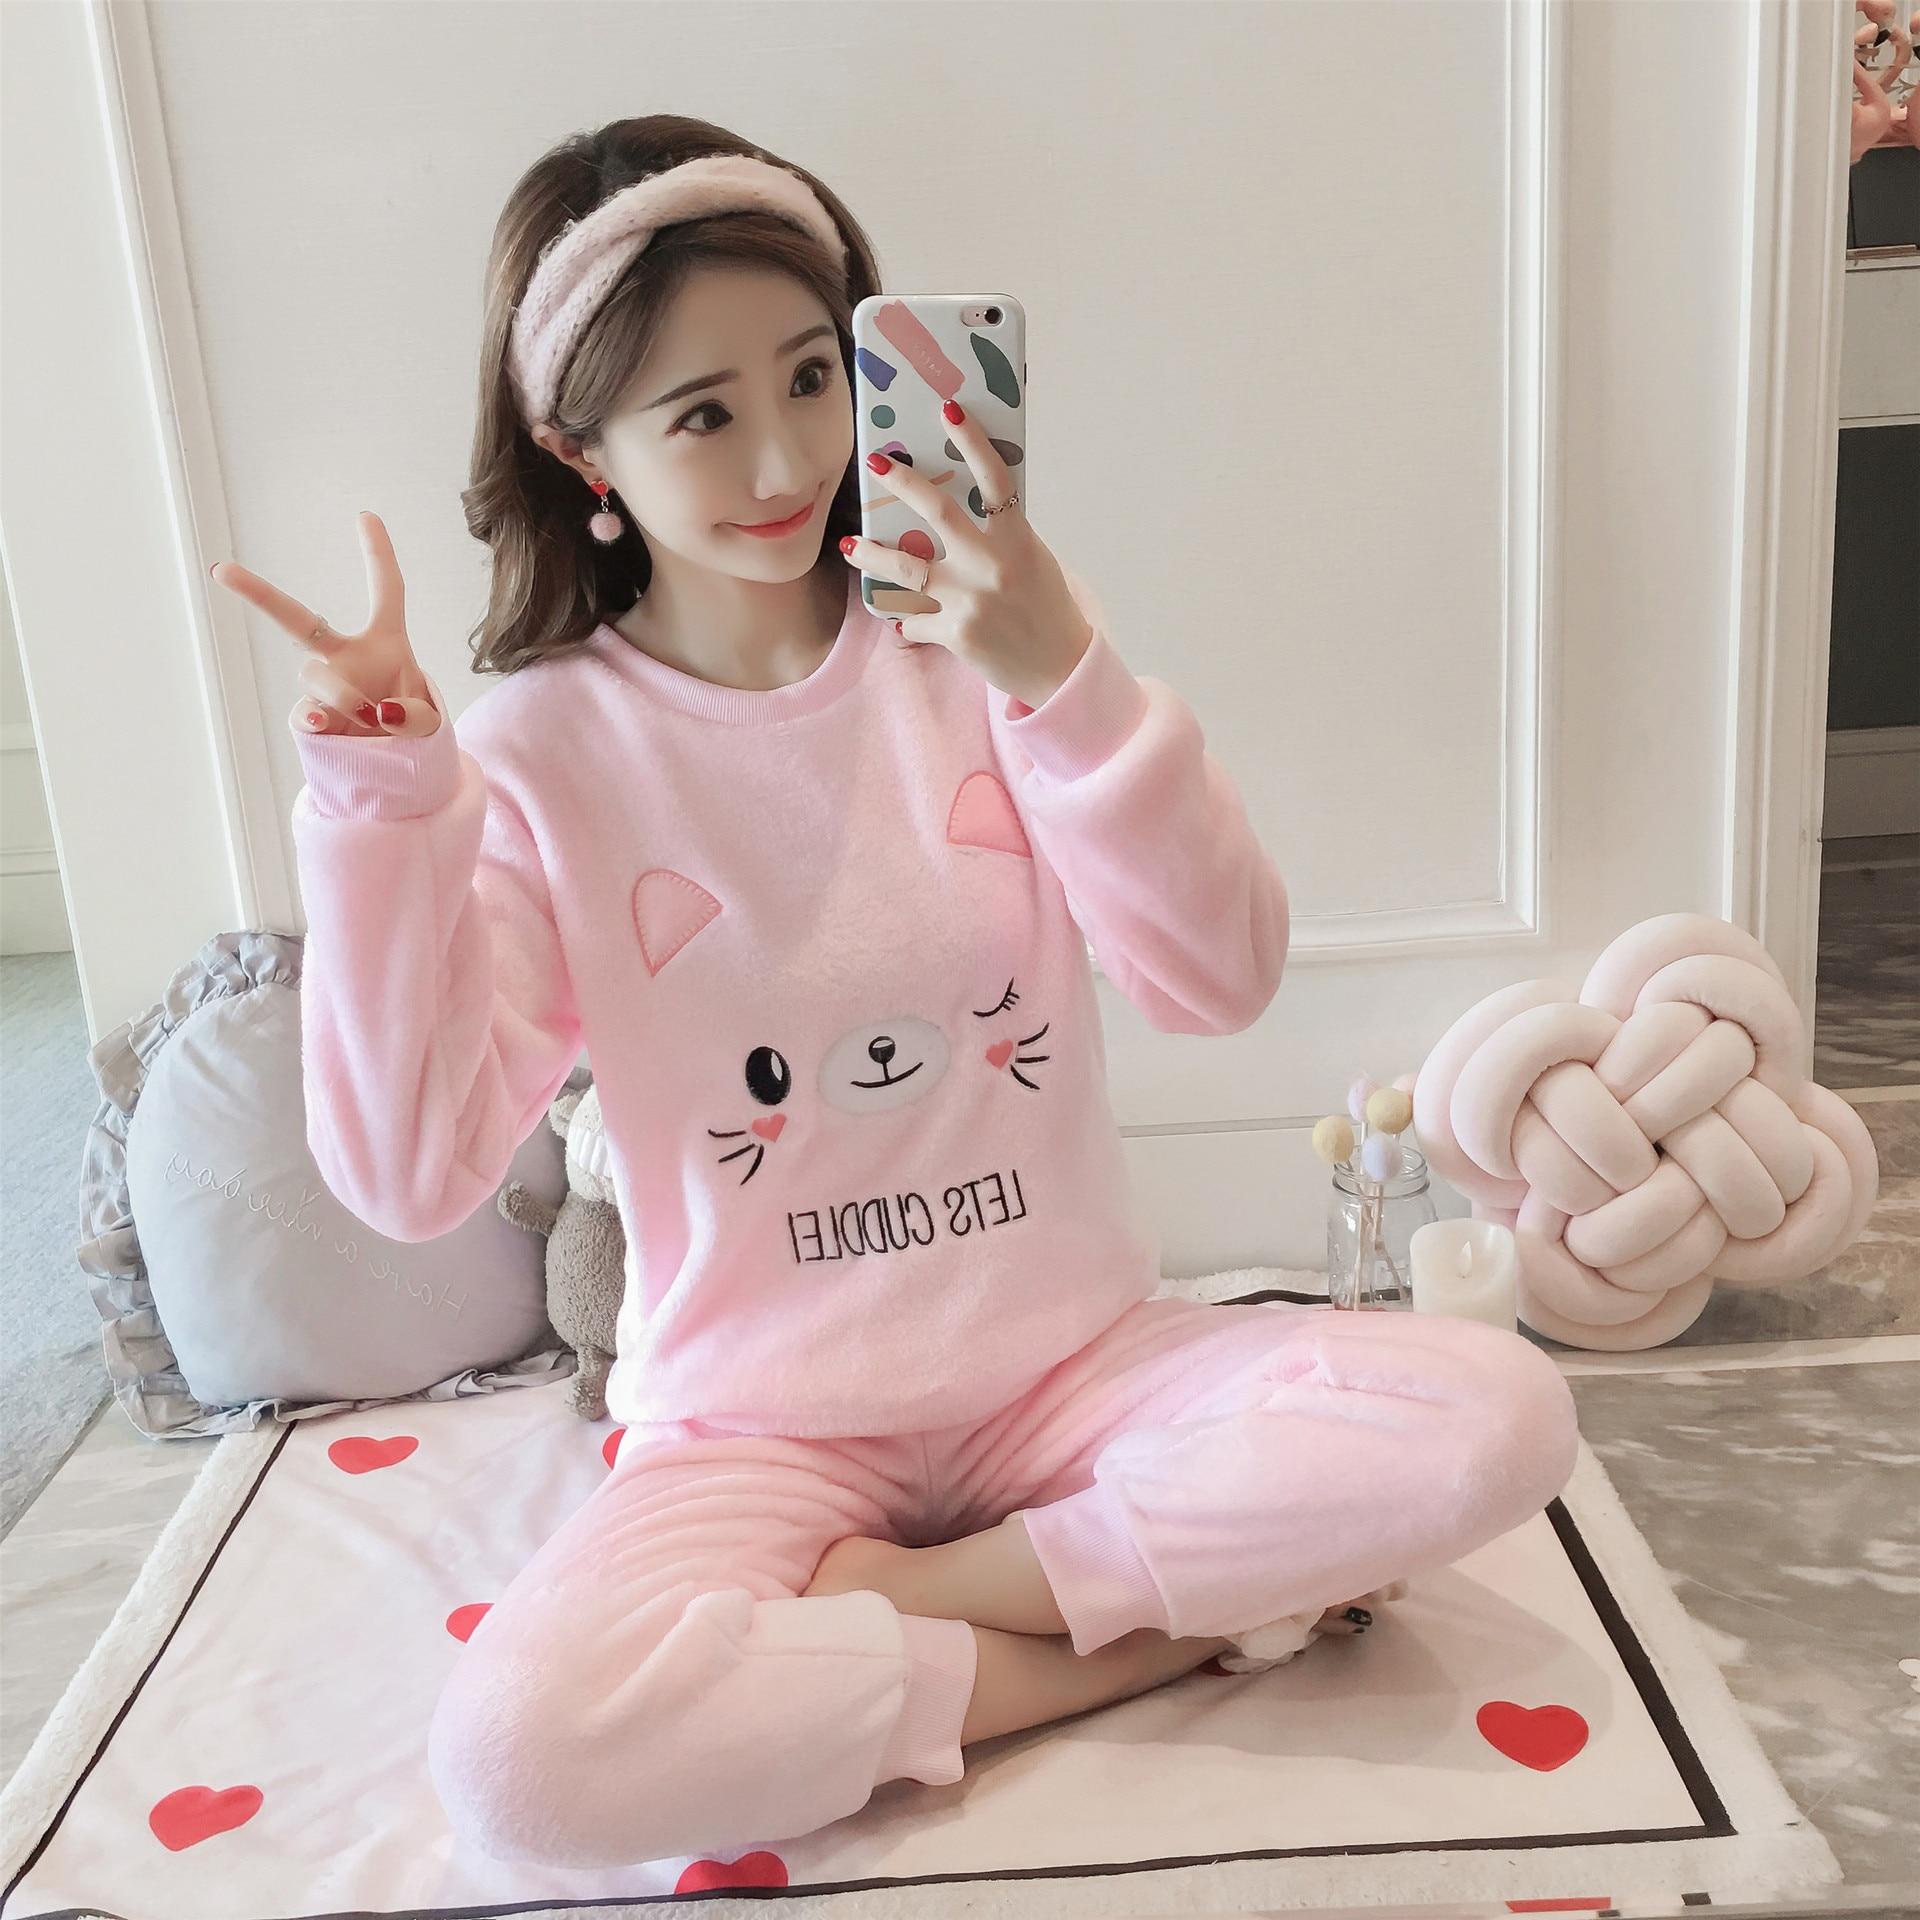 Fleece Thick Cartoon Print Cheshire Cat Pajamas 2019 Sprint Winter Long Pants 2 Pieces Pajama Set Elastic Waist Pyjamas S99102